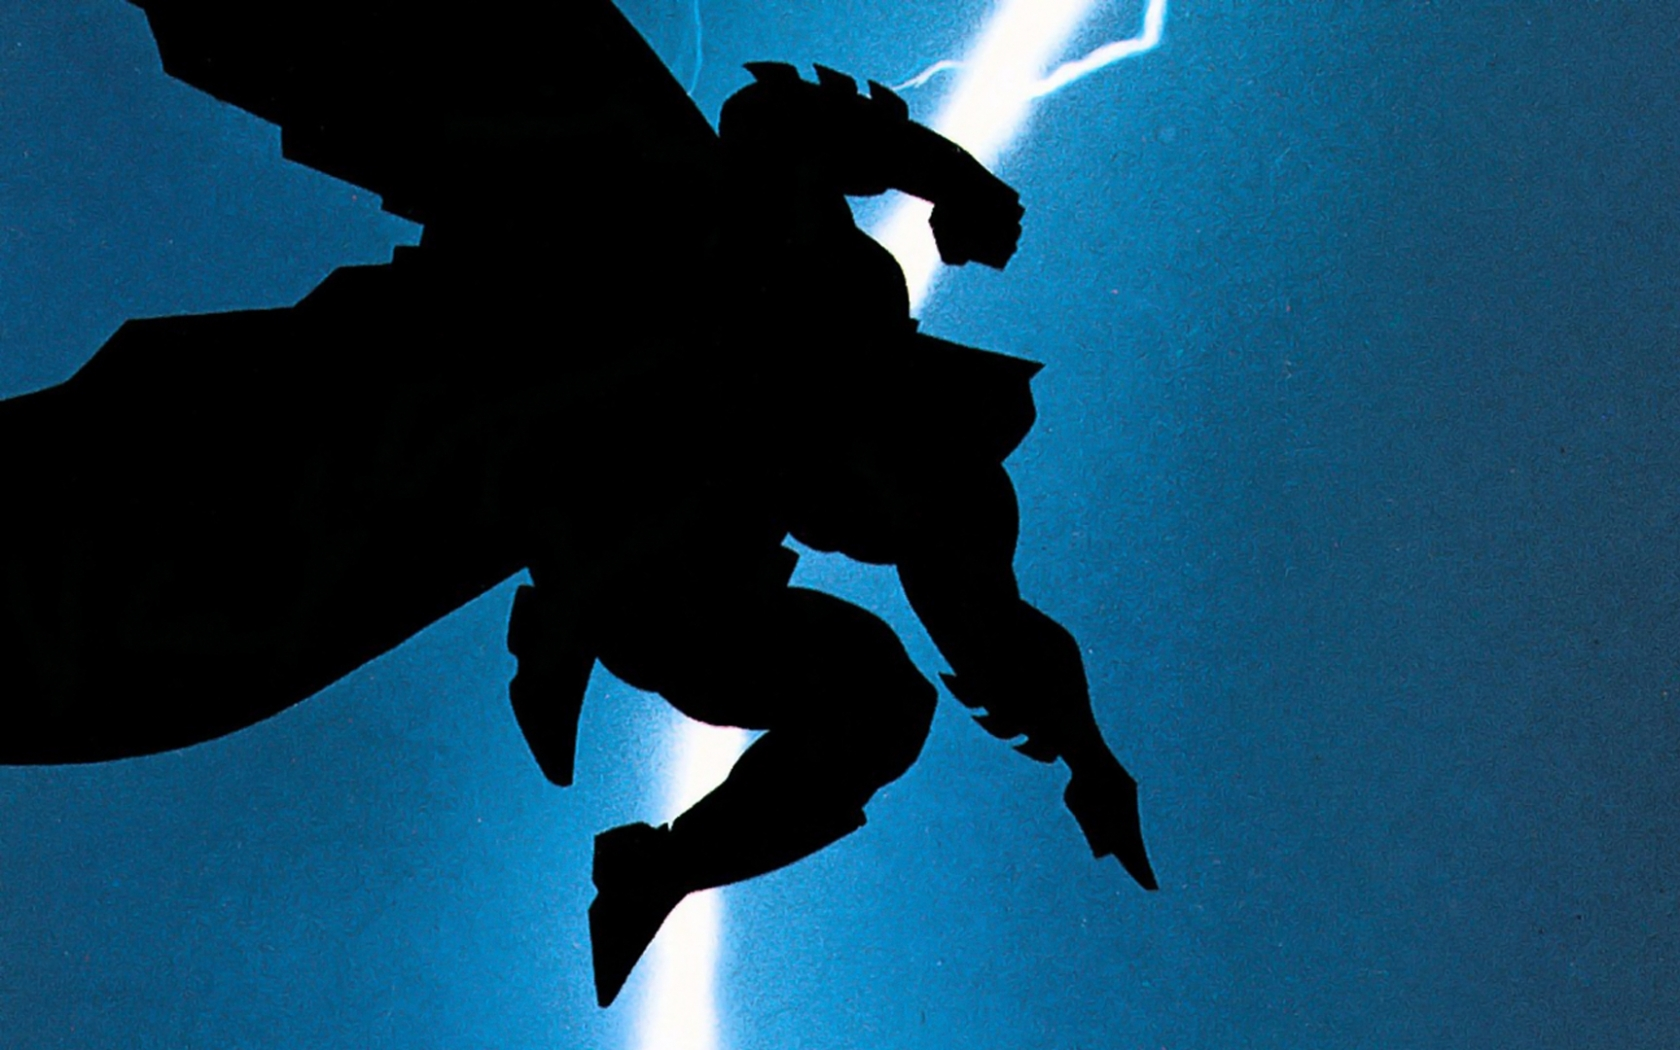 batman the dark knight returns frank miller 1920x1080 wallpaper Art HD 1680x1050